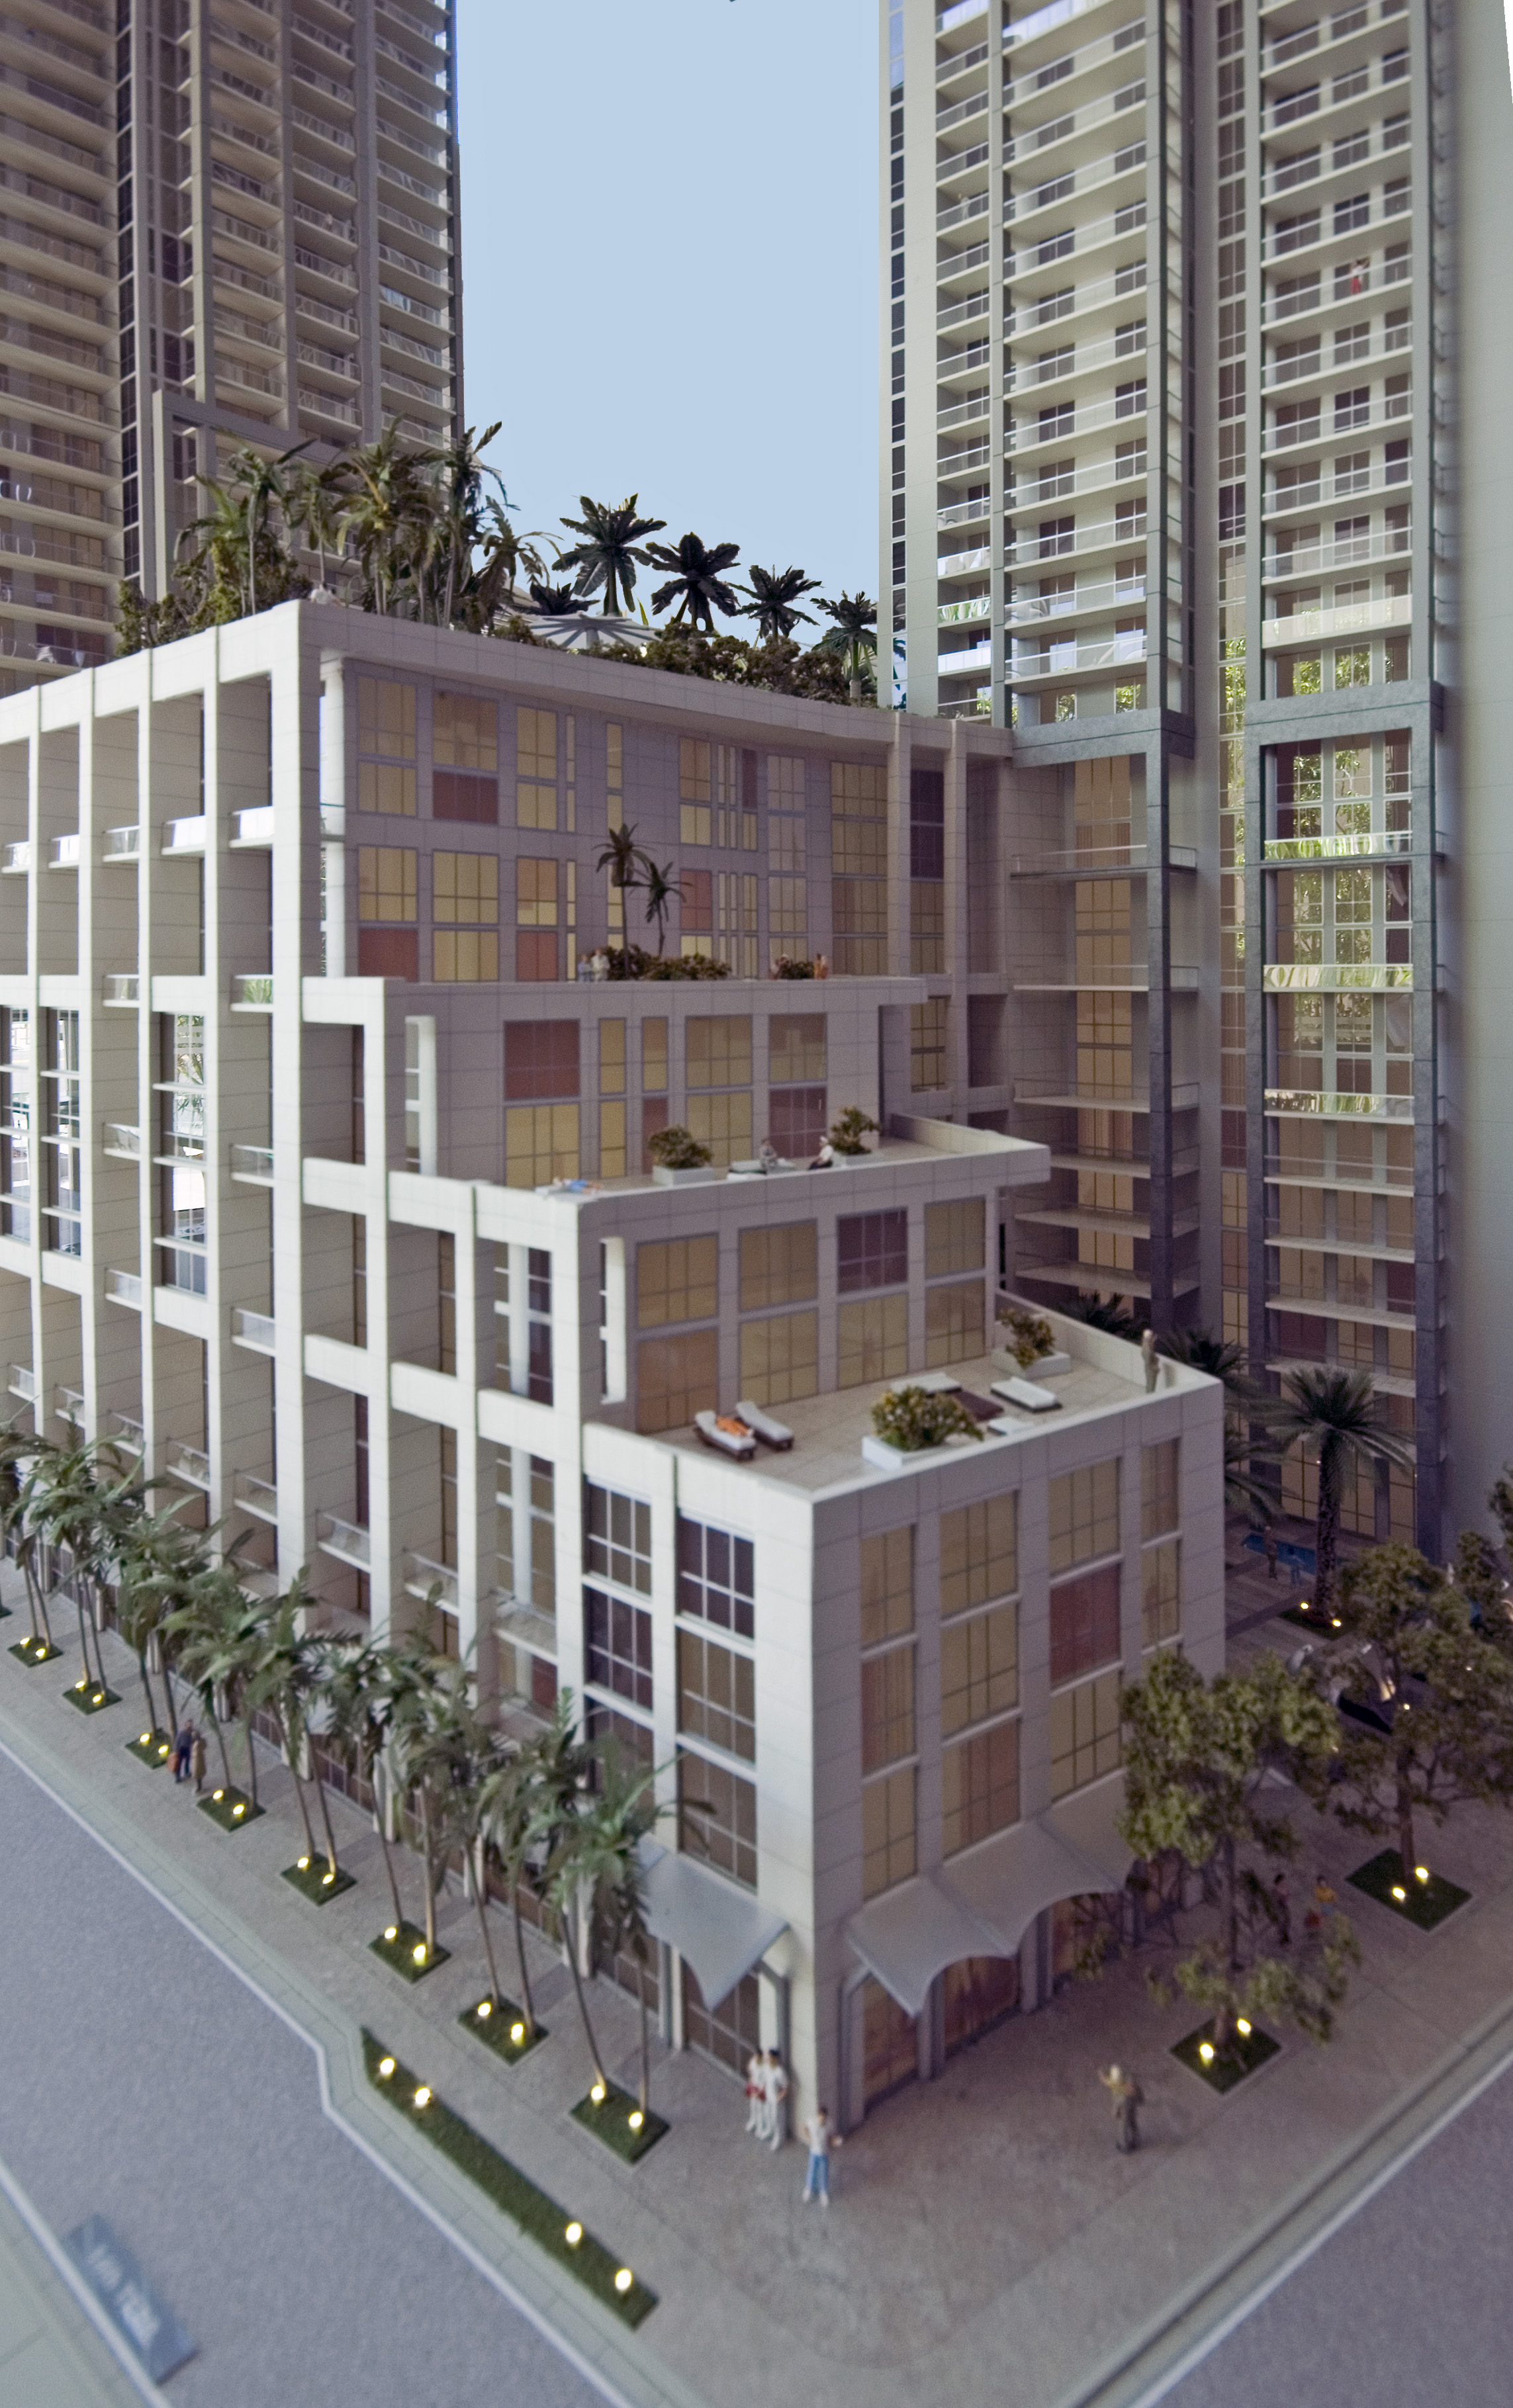 Capital at Brickell | Architect: Fullerton Diaz Architects